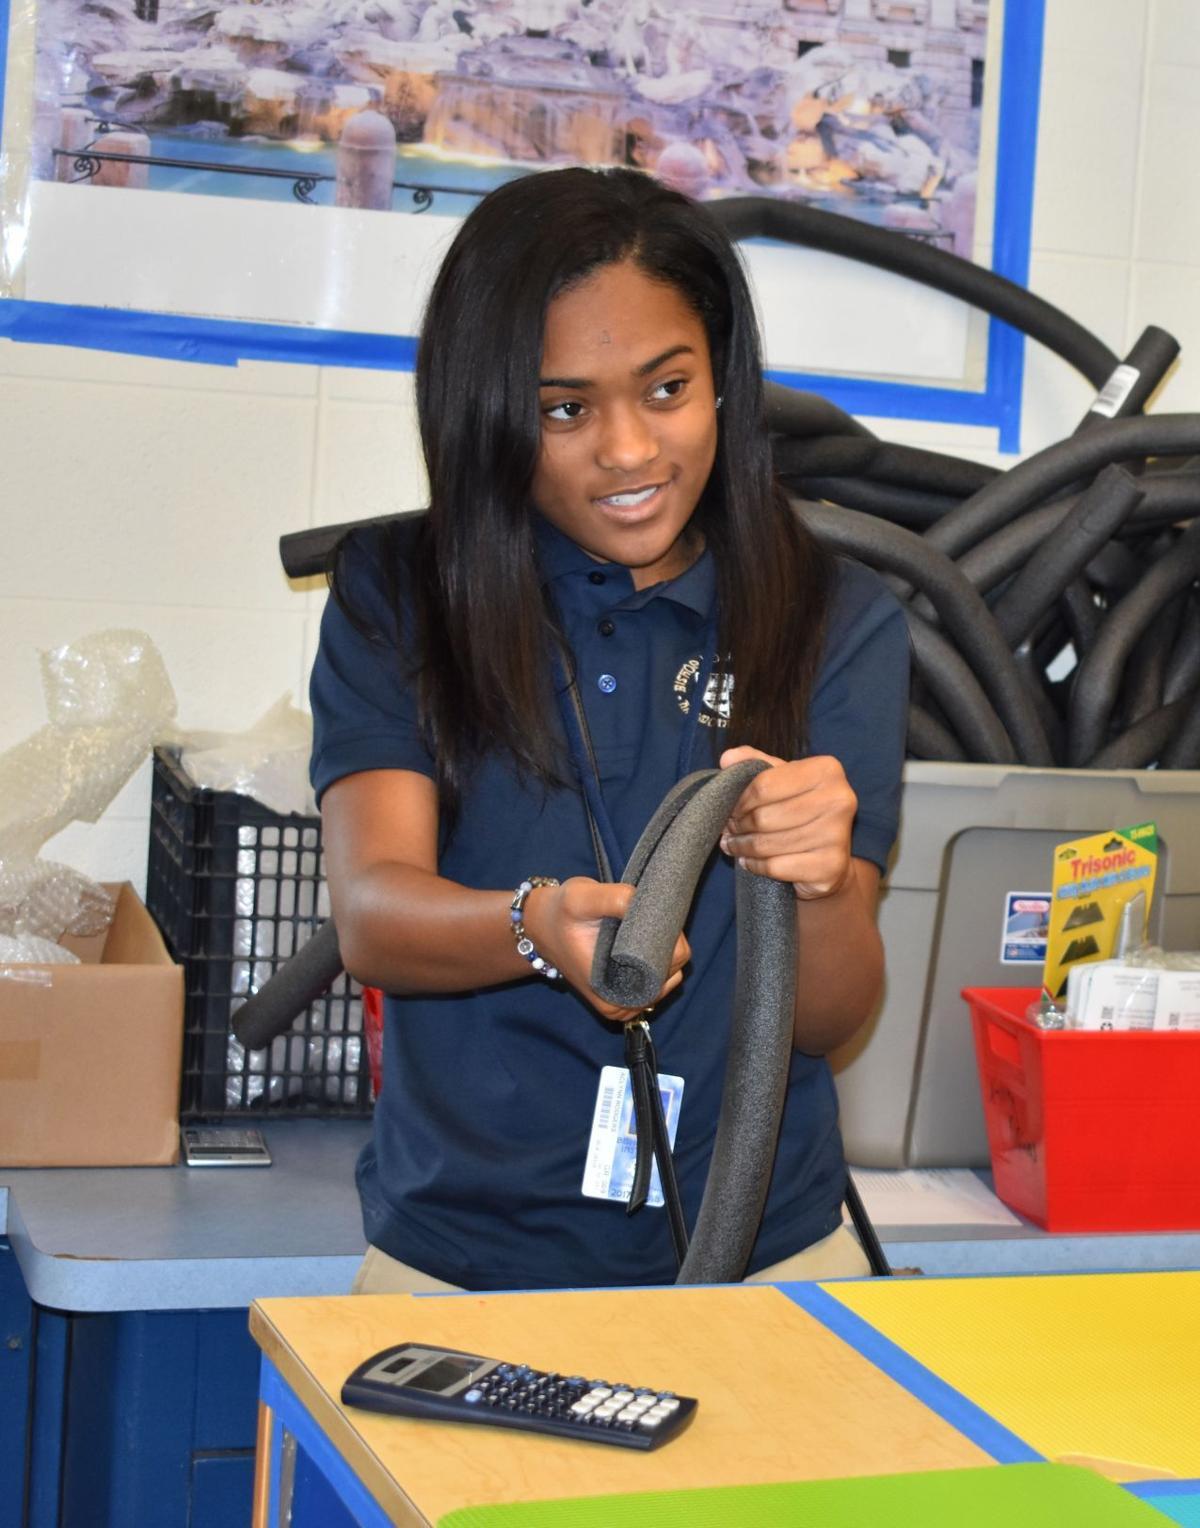 Bishop Noll STEM teacher leads the way